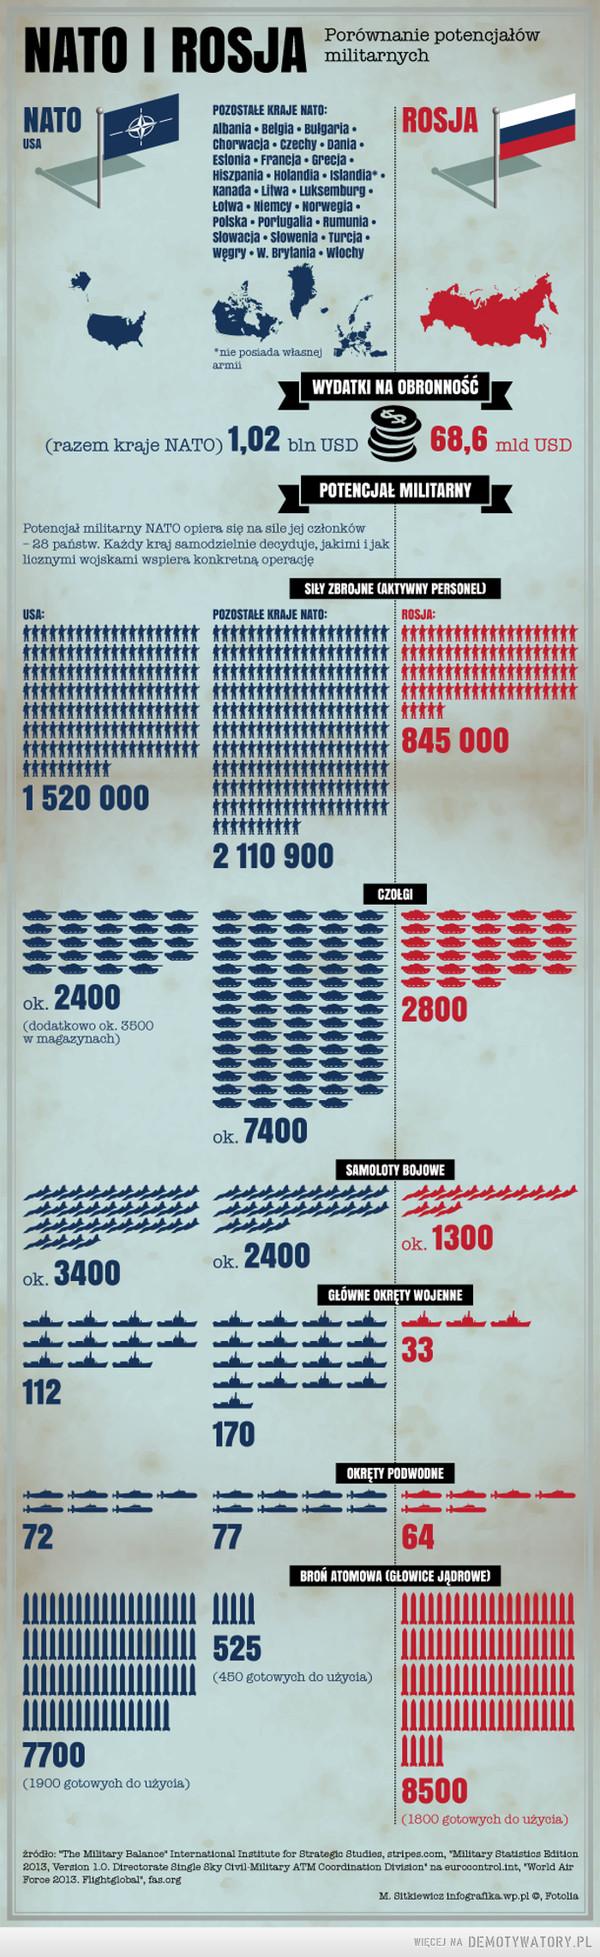 NATO I ROSJA – Die Welt